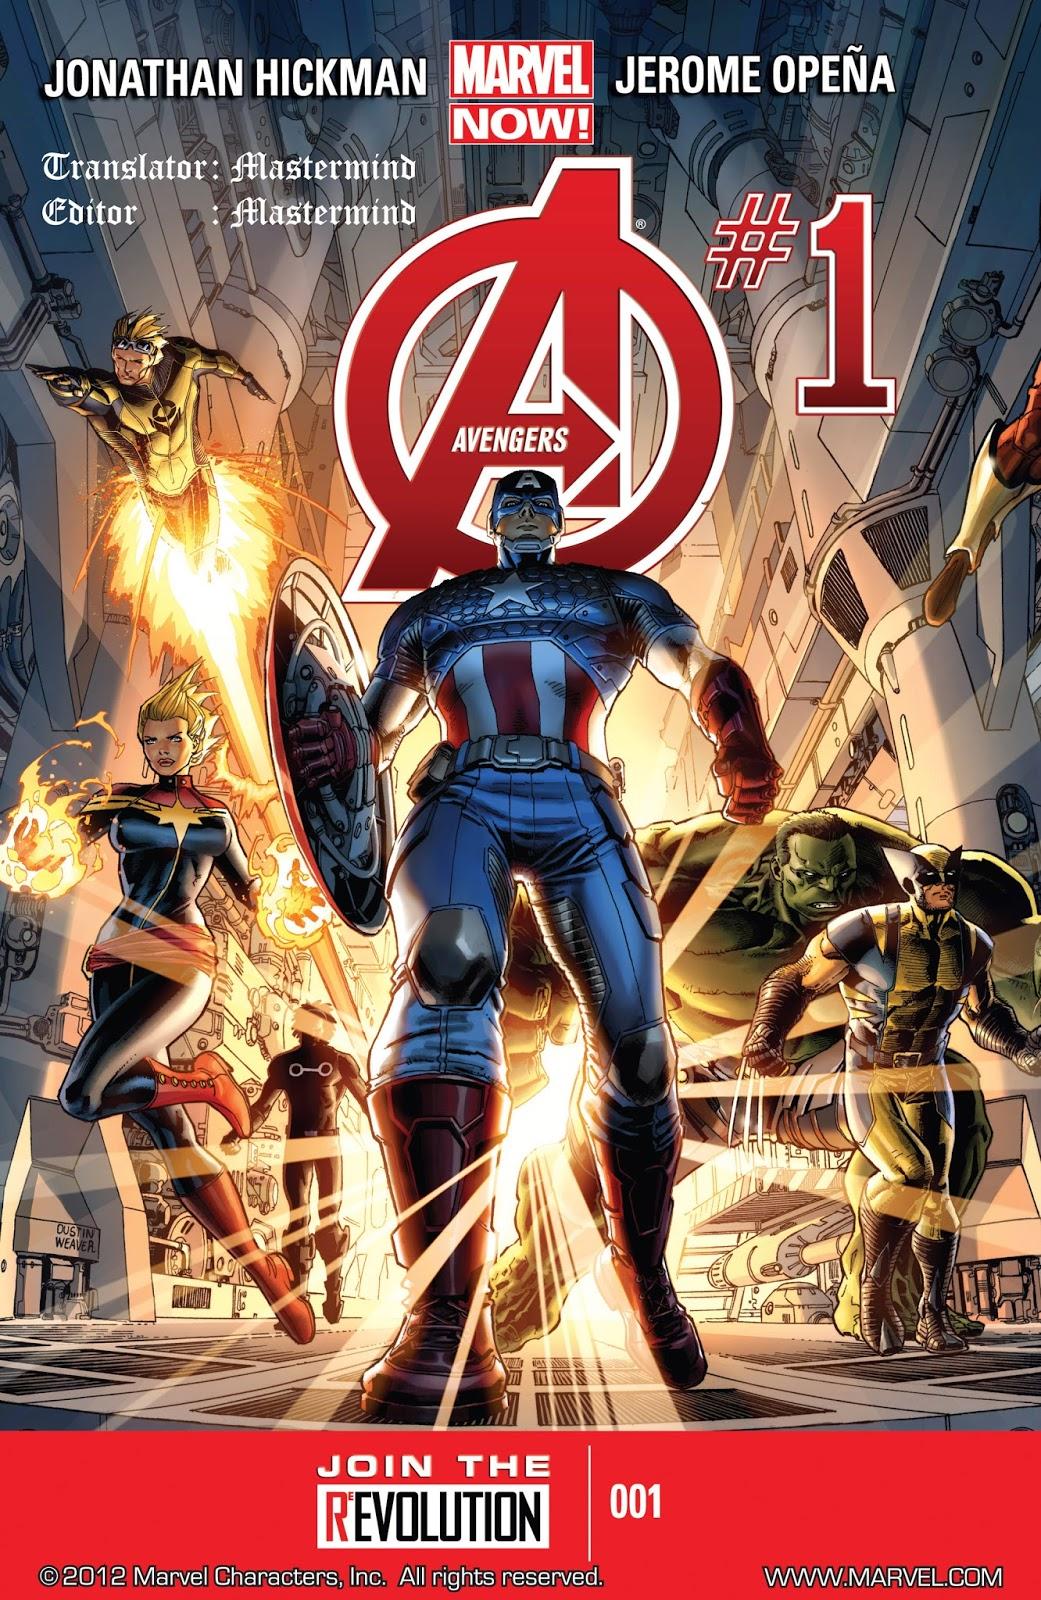 Komik Amerika Bahasa Indonesia: Avengers #1